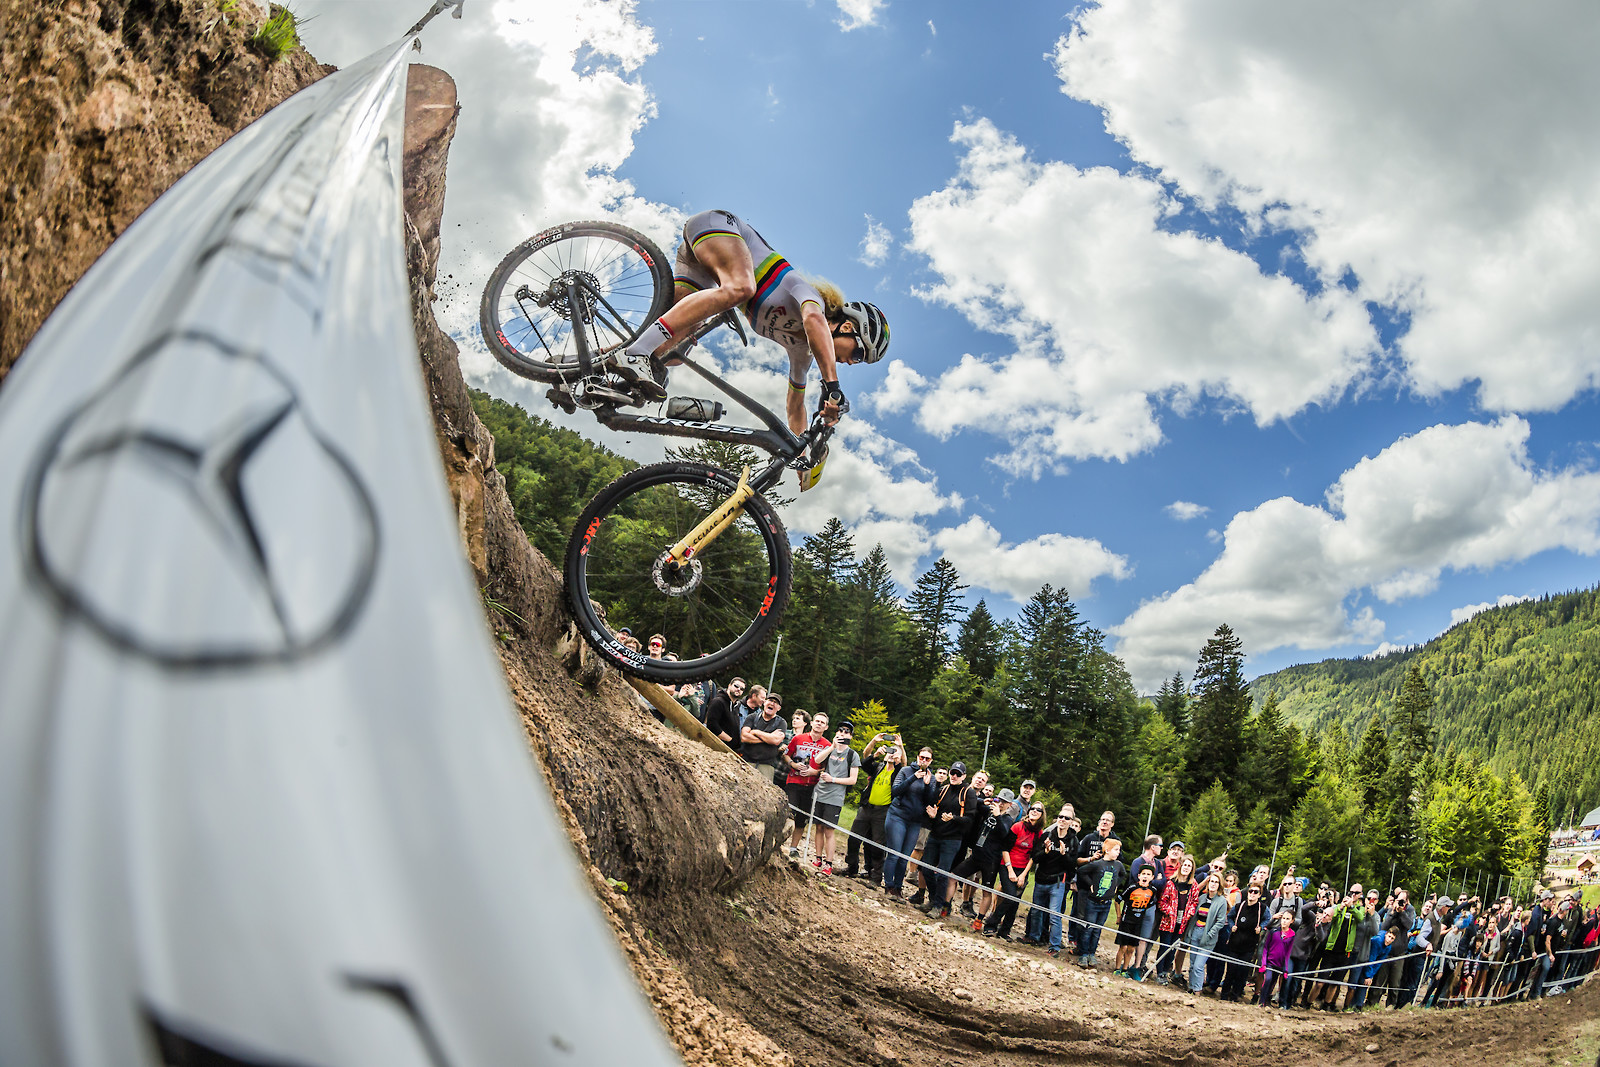 46483471654 5fdf3bf5f4 o - phunkt.com - Mountain Biking Pictures - Vital MTB